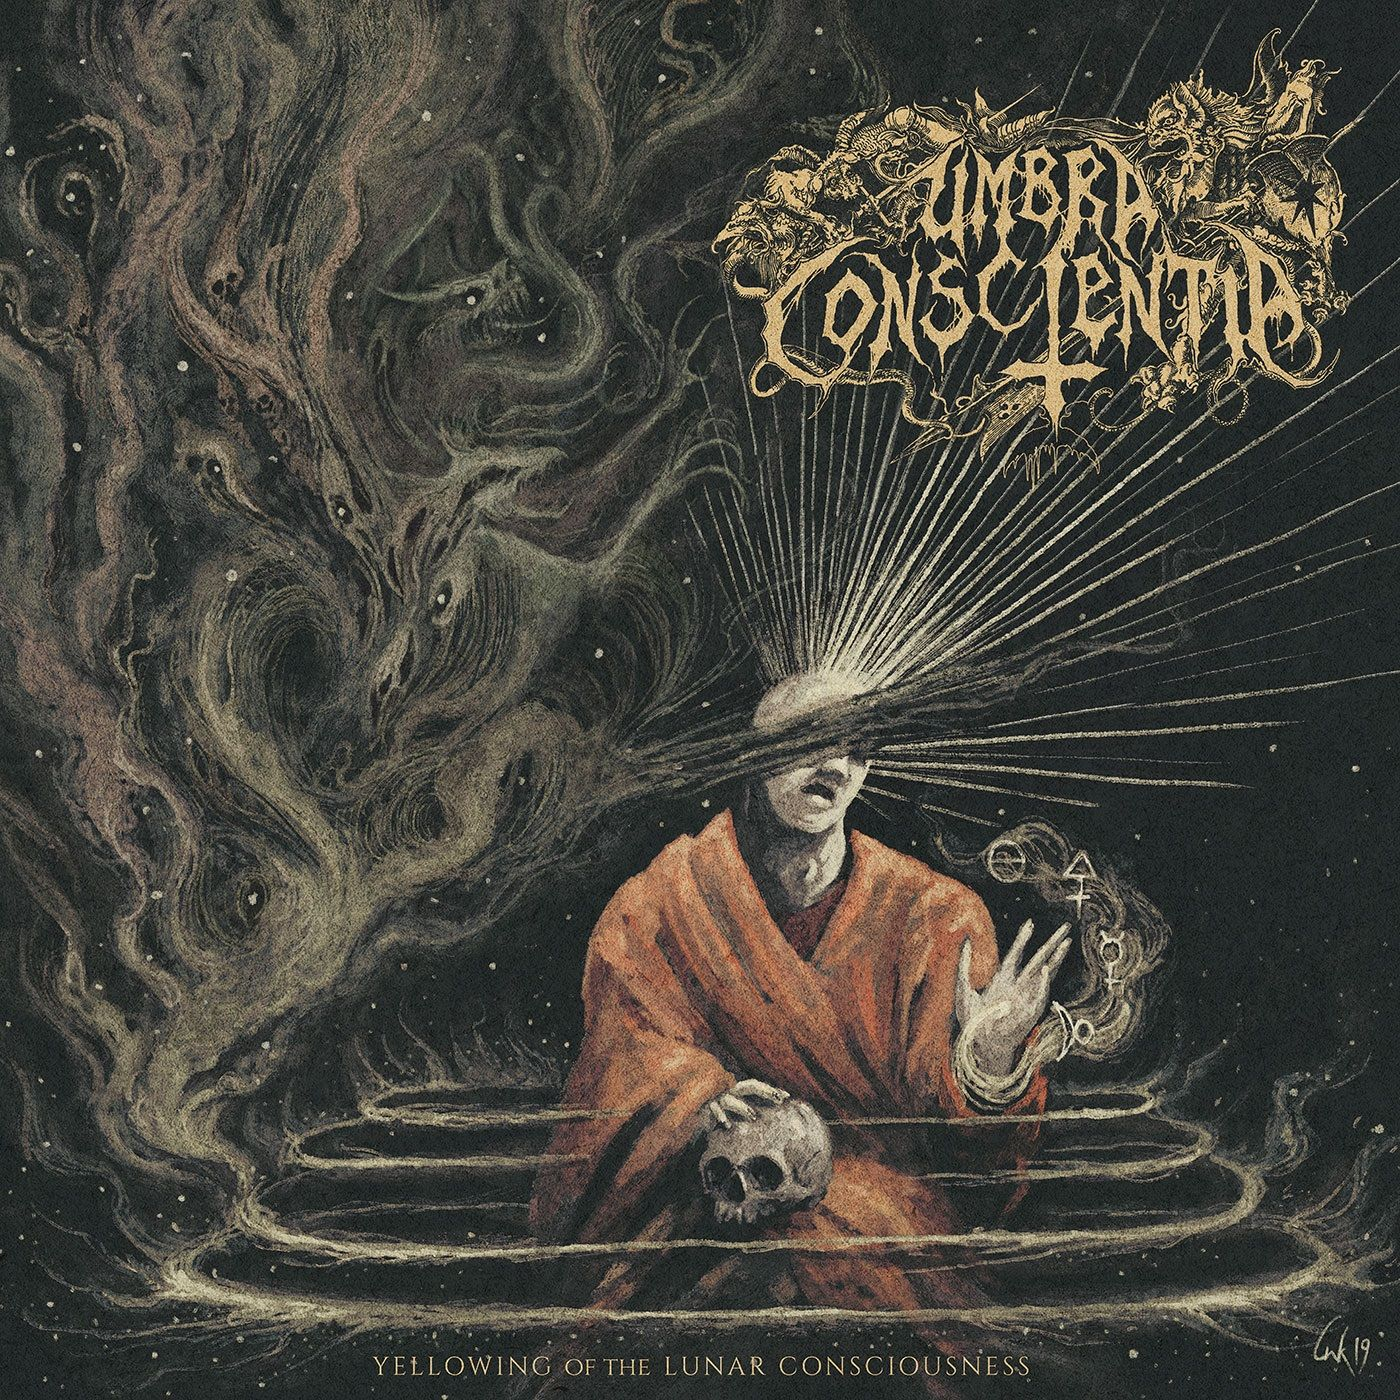 Reviews for Umbra Conscientia - Yellowing of the Lunar Consciousness